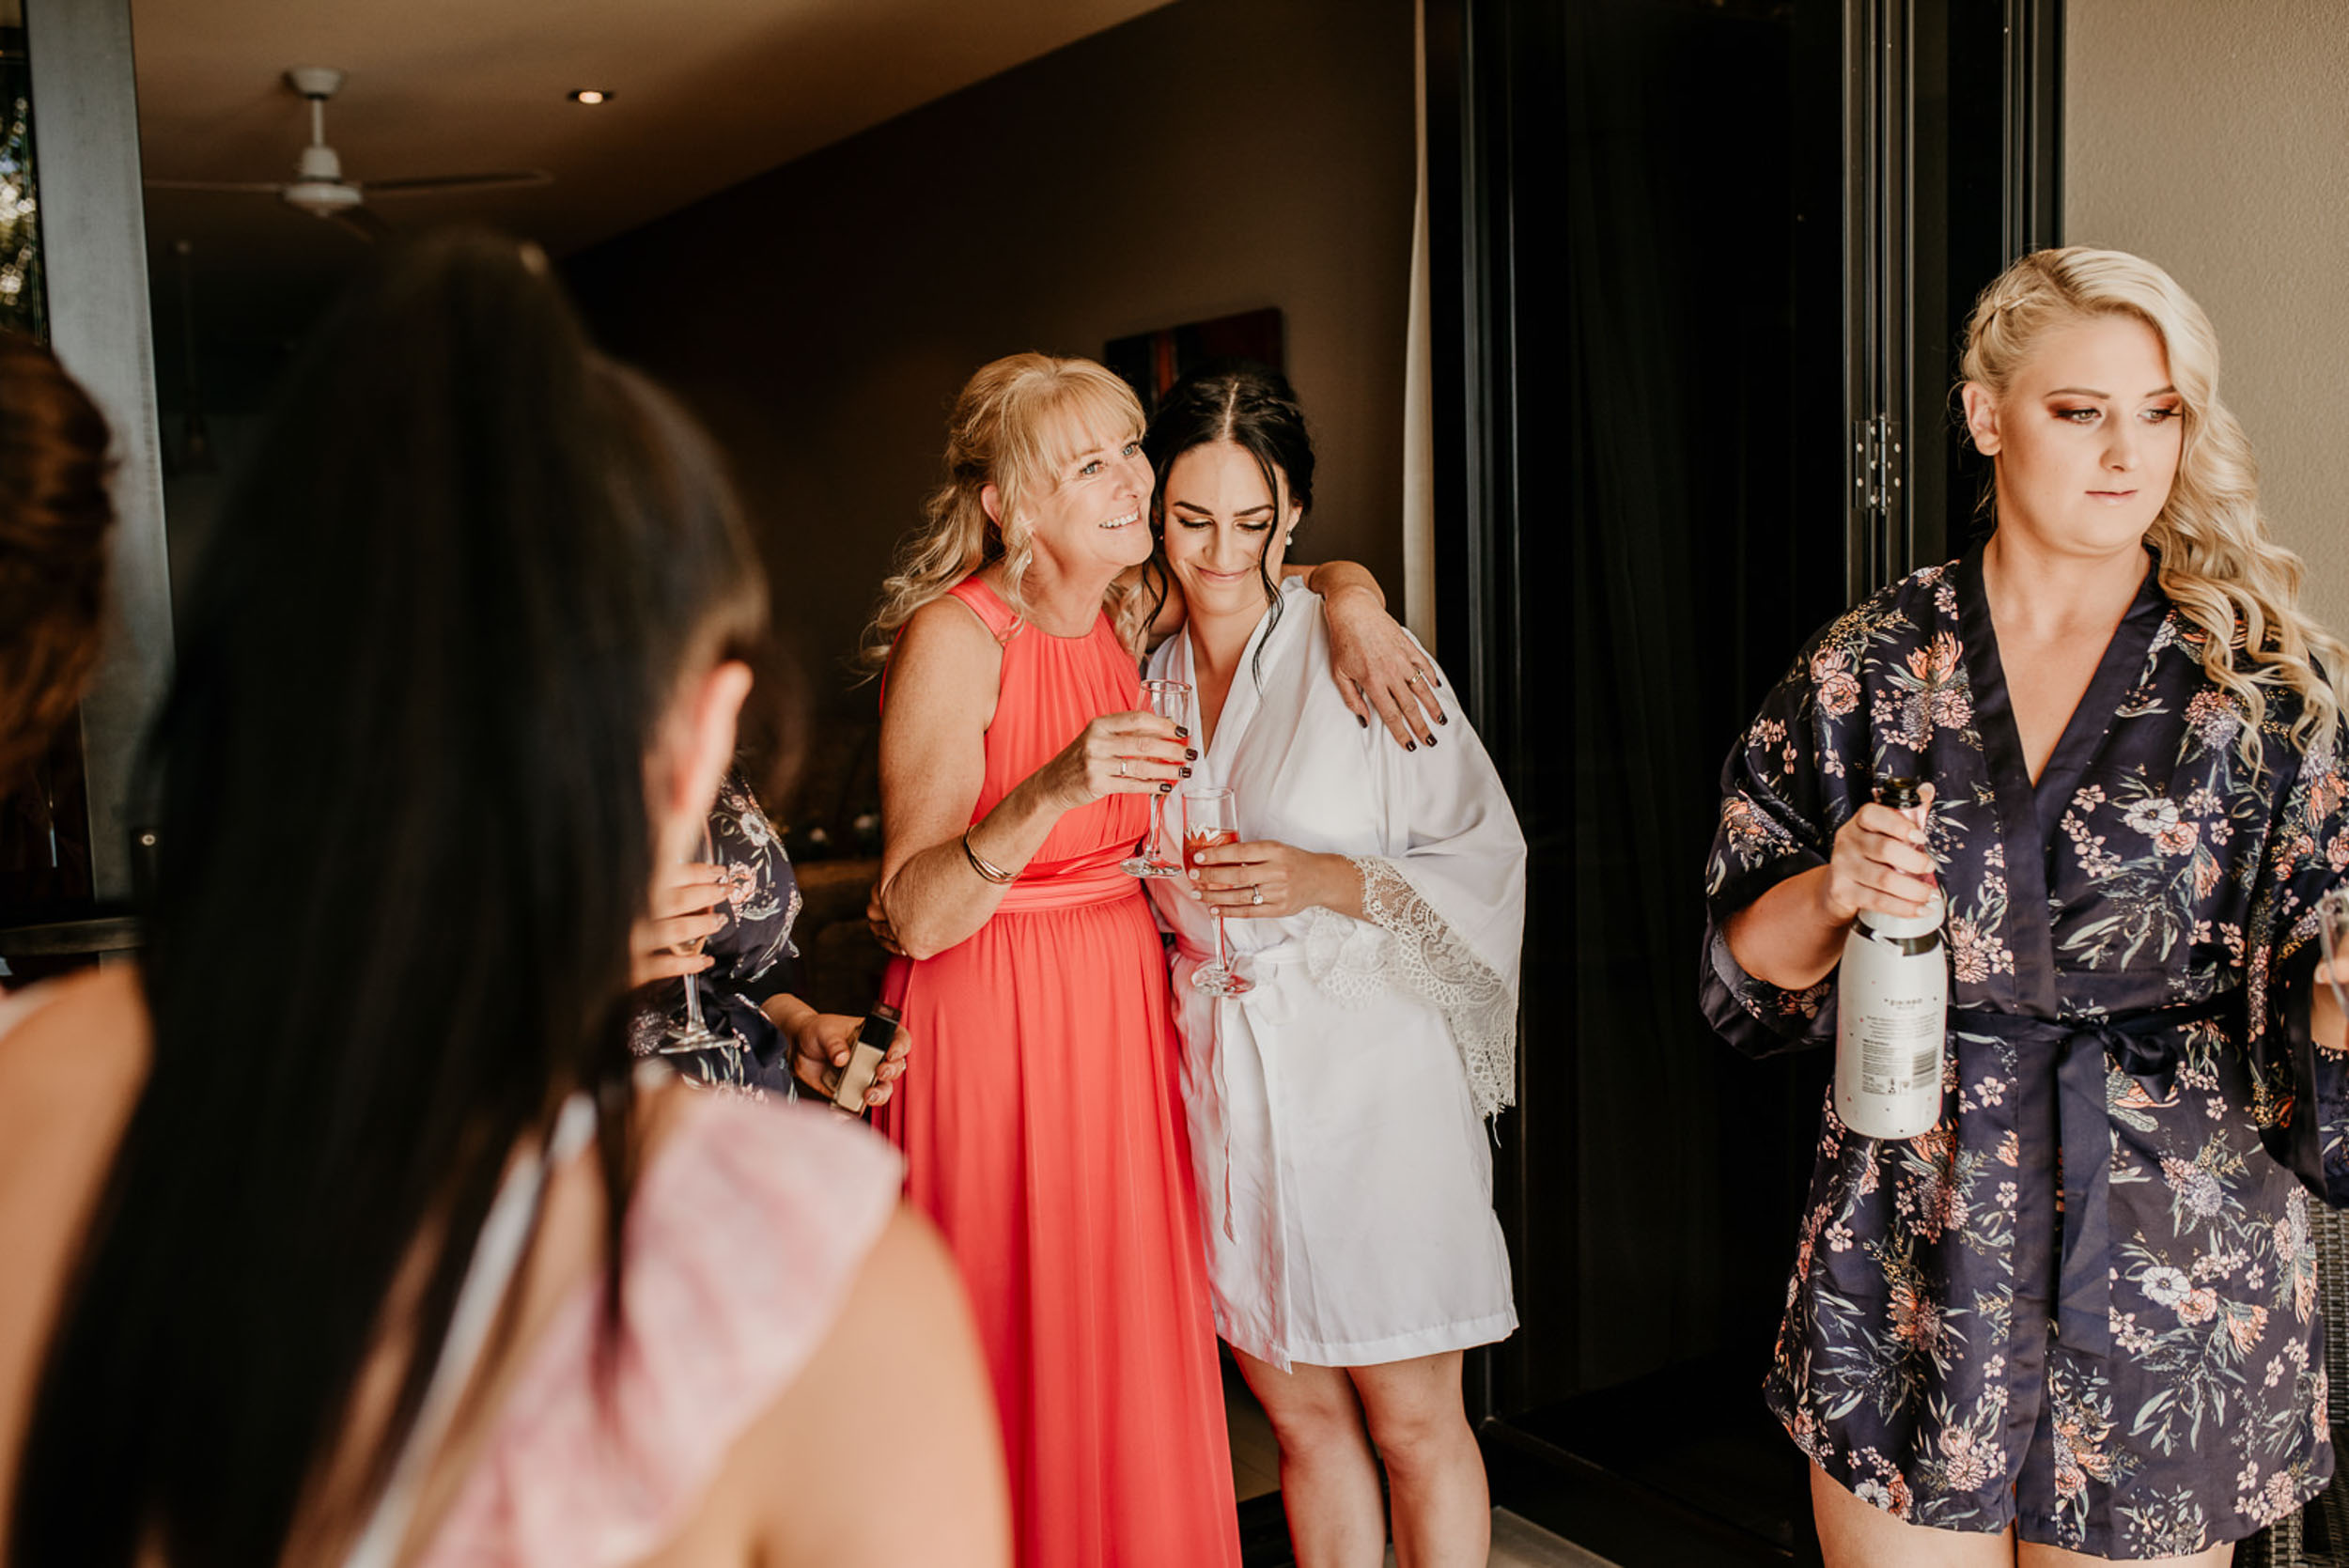 The Raw Photographer - Cairns Wedding Photographer - Fitzroy Island - Destination Wedding - Bride Dress - Groom Portrait - Queensland-8.jpg